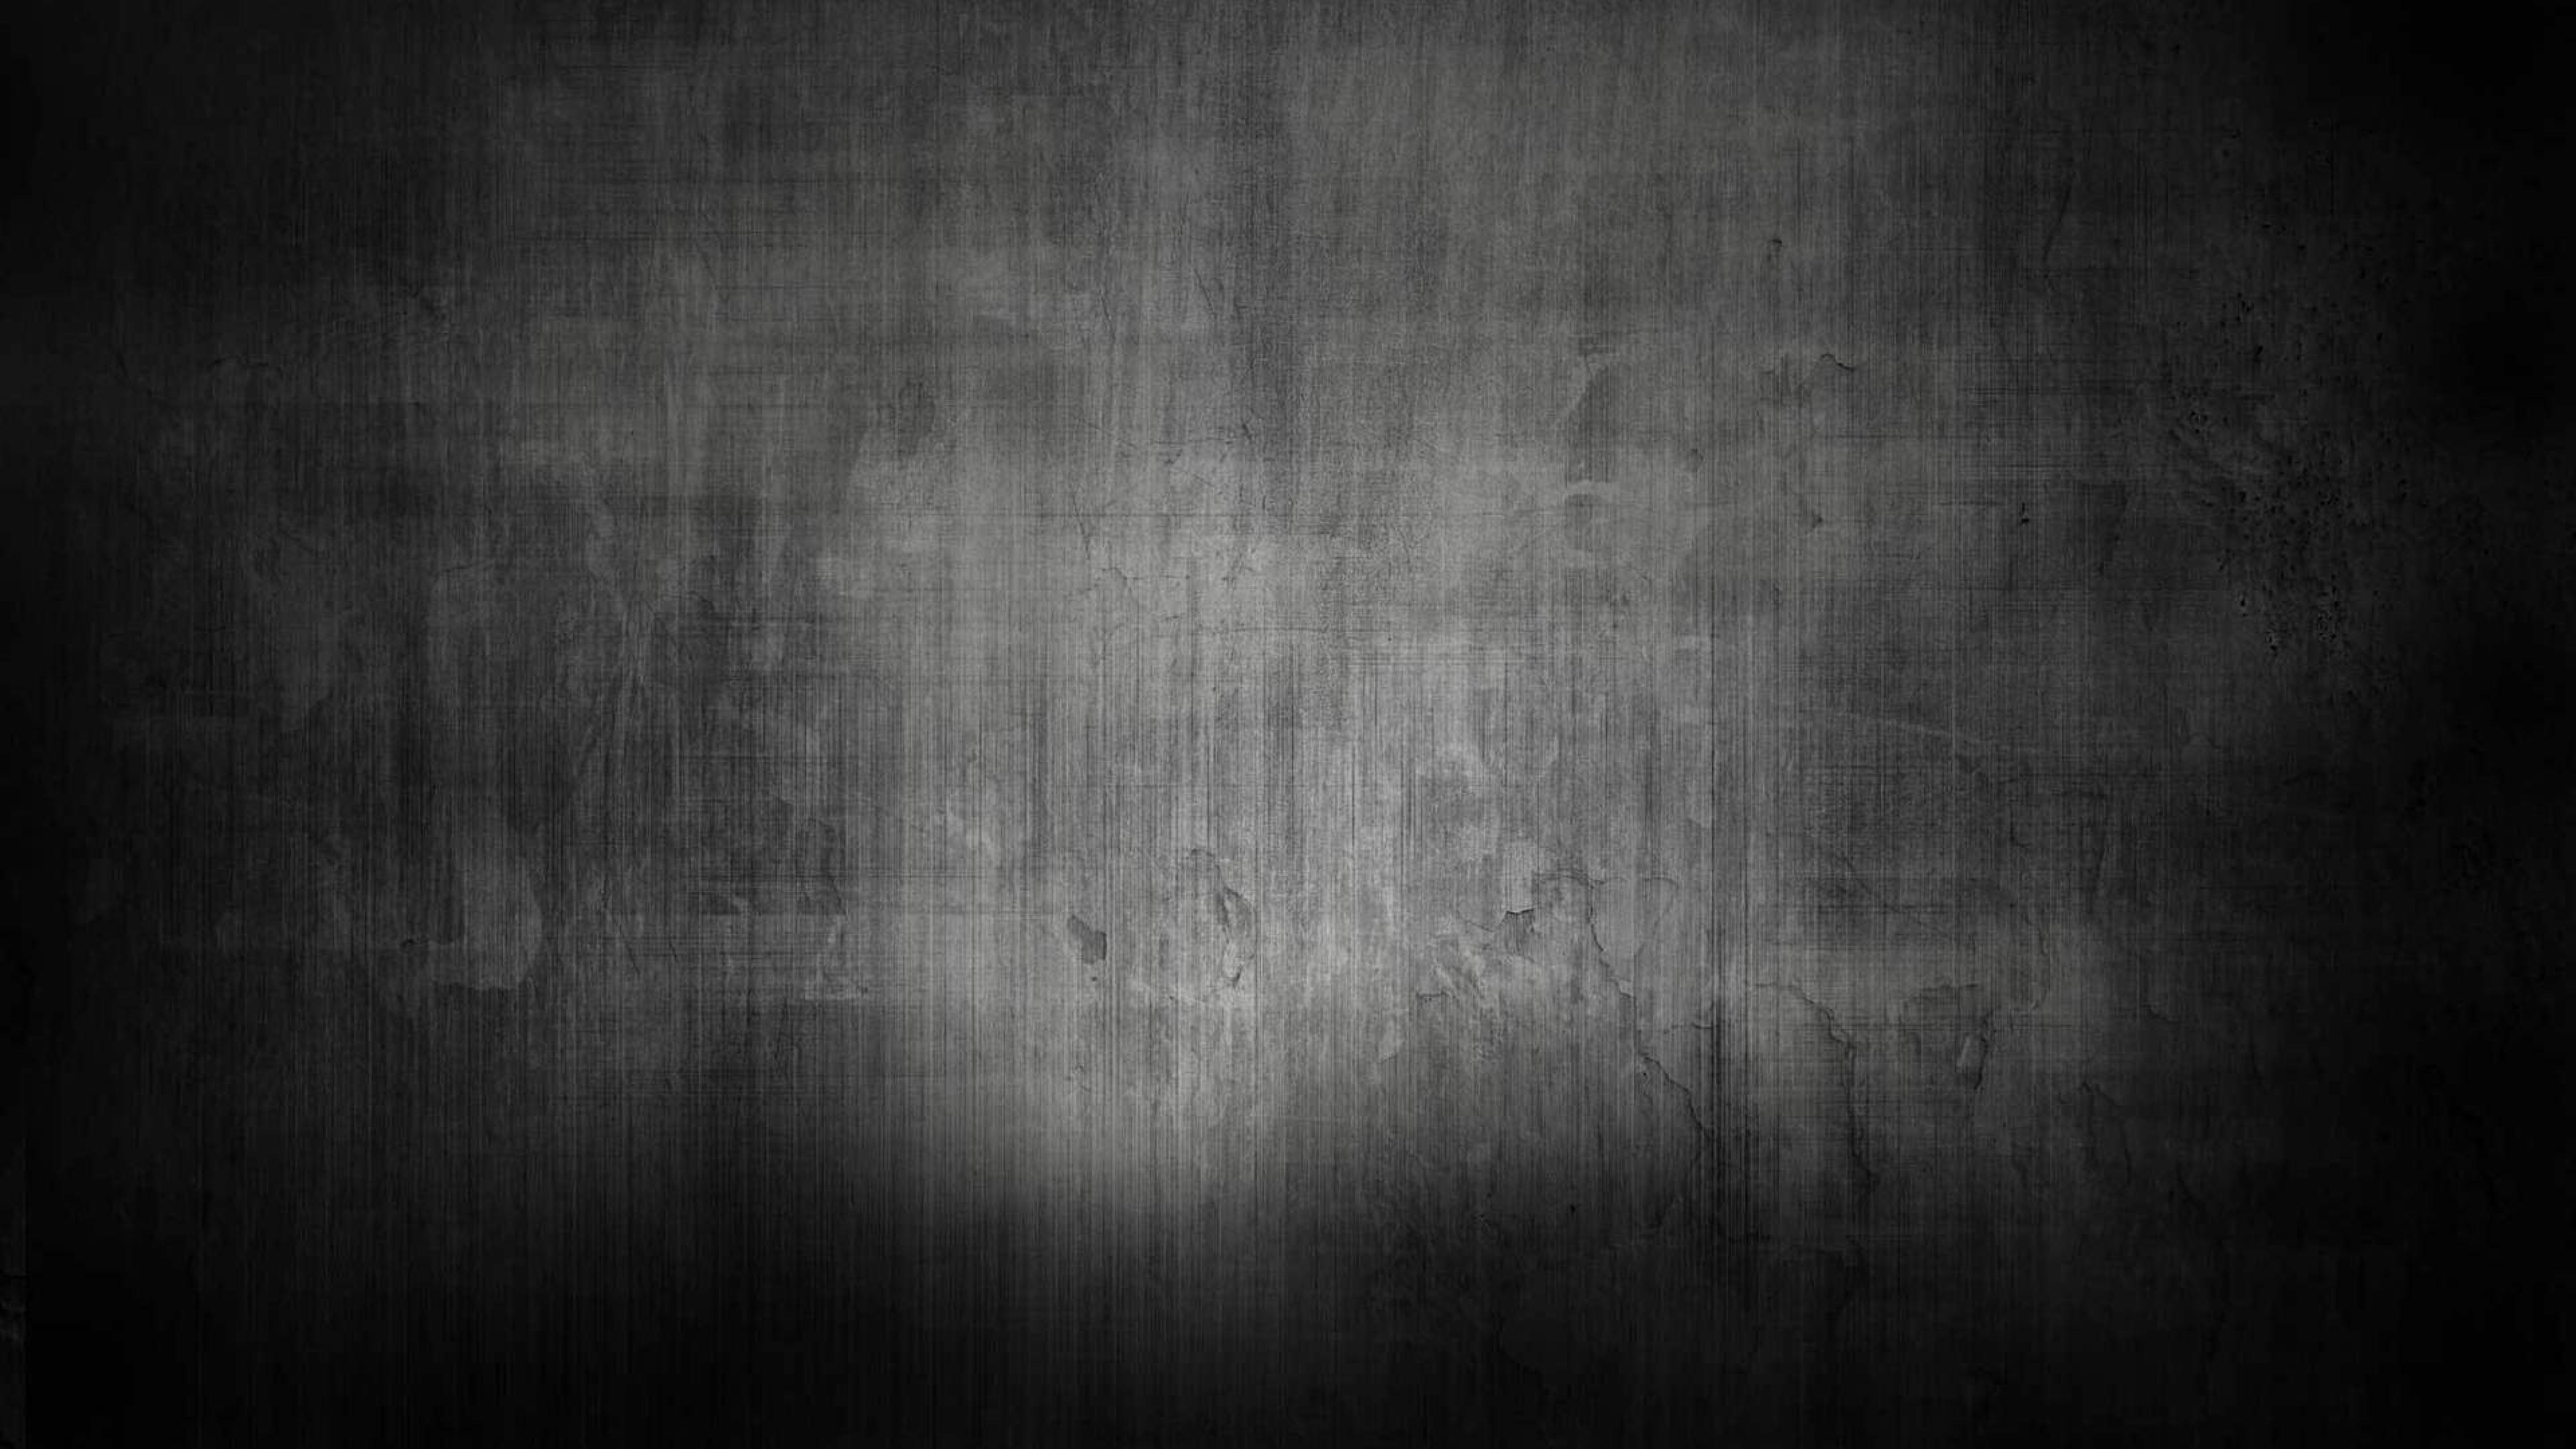 Dark Spot Background Texture Wallpaper Background 4K Ultra HD 3840x2160